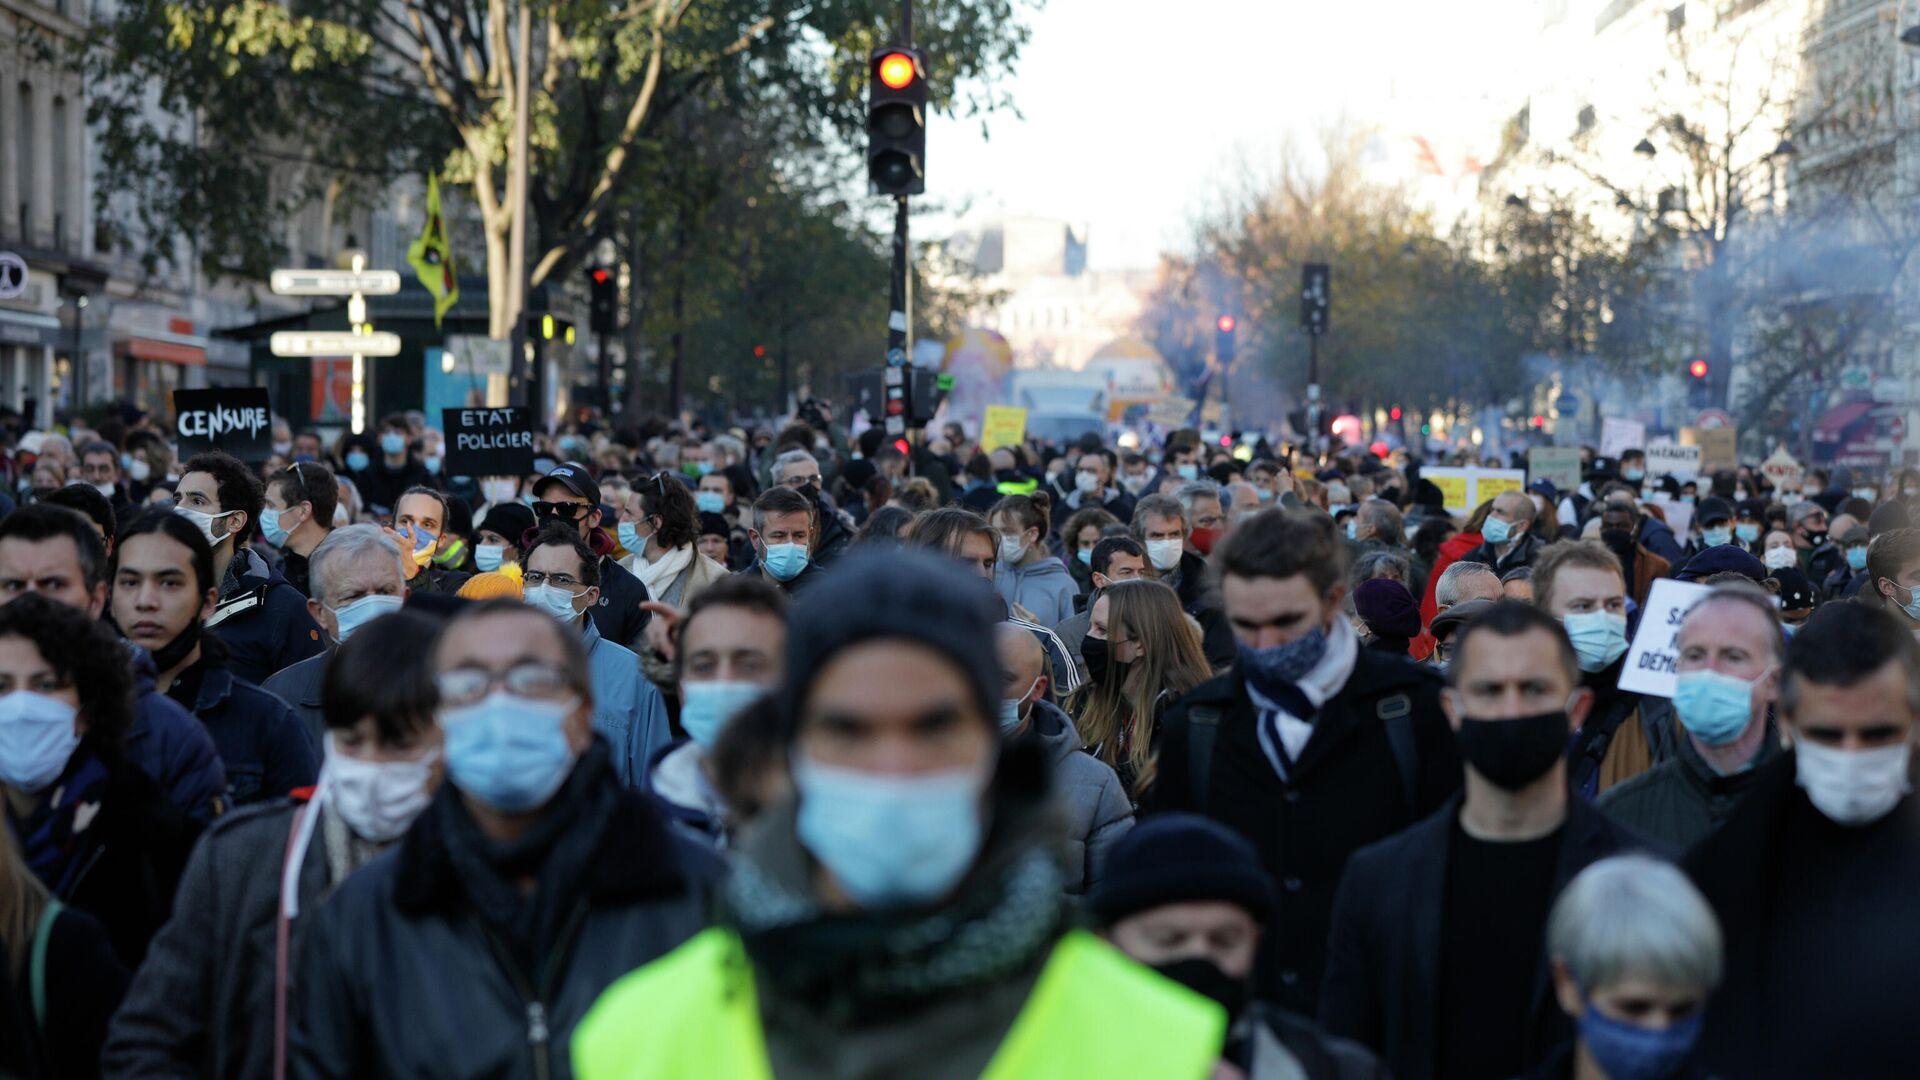 Участники акции протеста против закона о запрете на распространение изображений полицейских в Париже - РИА Новости, 1920, 28.11.2020